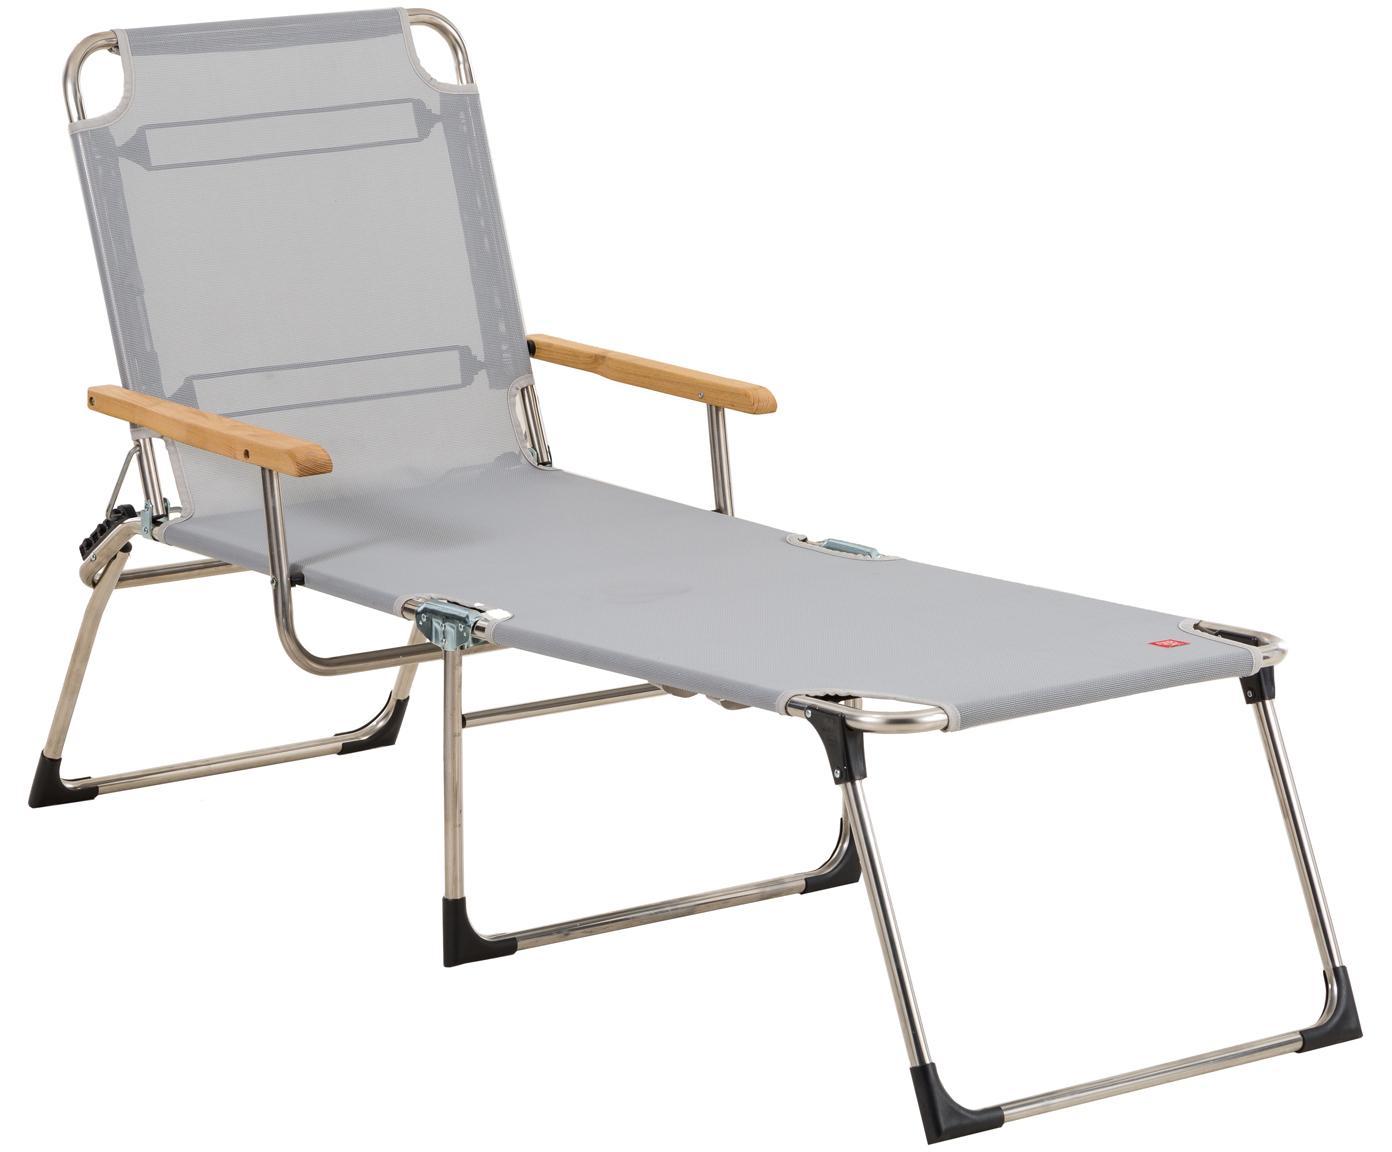 Outdoor ligstoel Amigo, Frame: aluminium, Bekleding: kunststofweefsel (weer- e, Armleuning: natuurlijk robiniahout, Grijs, robiniahoutkleurig, B 190 x D 69 cm